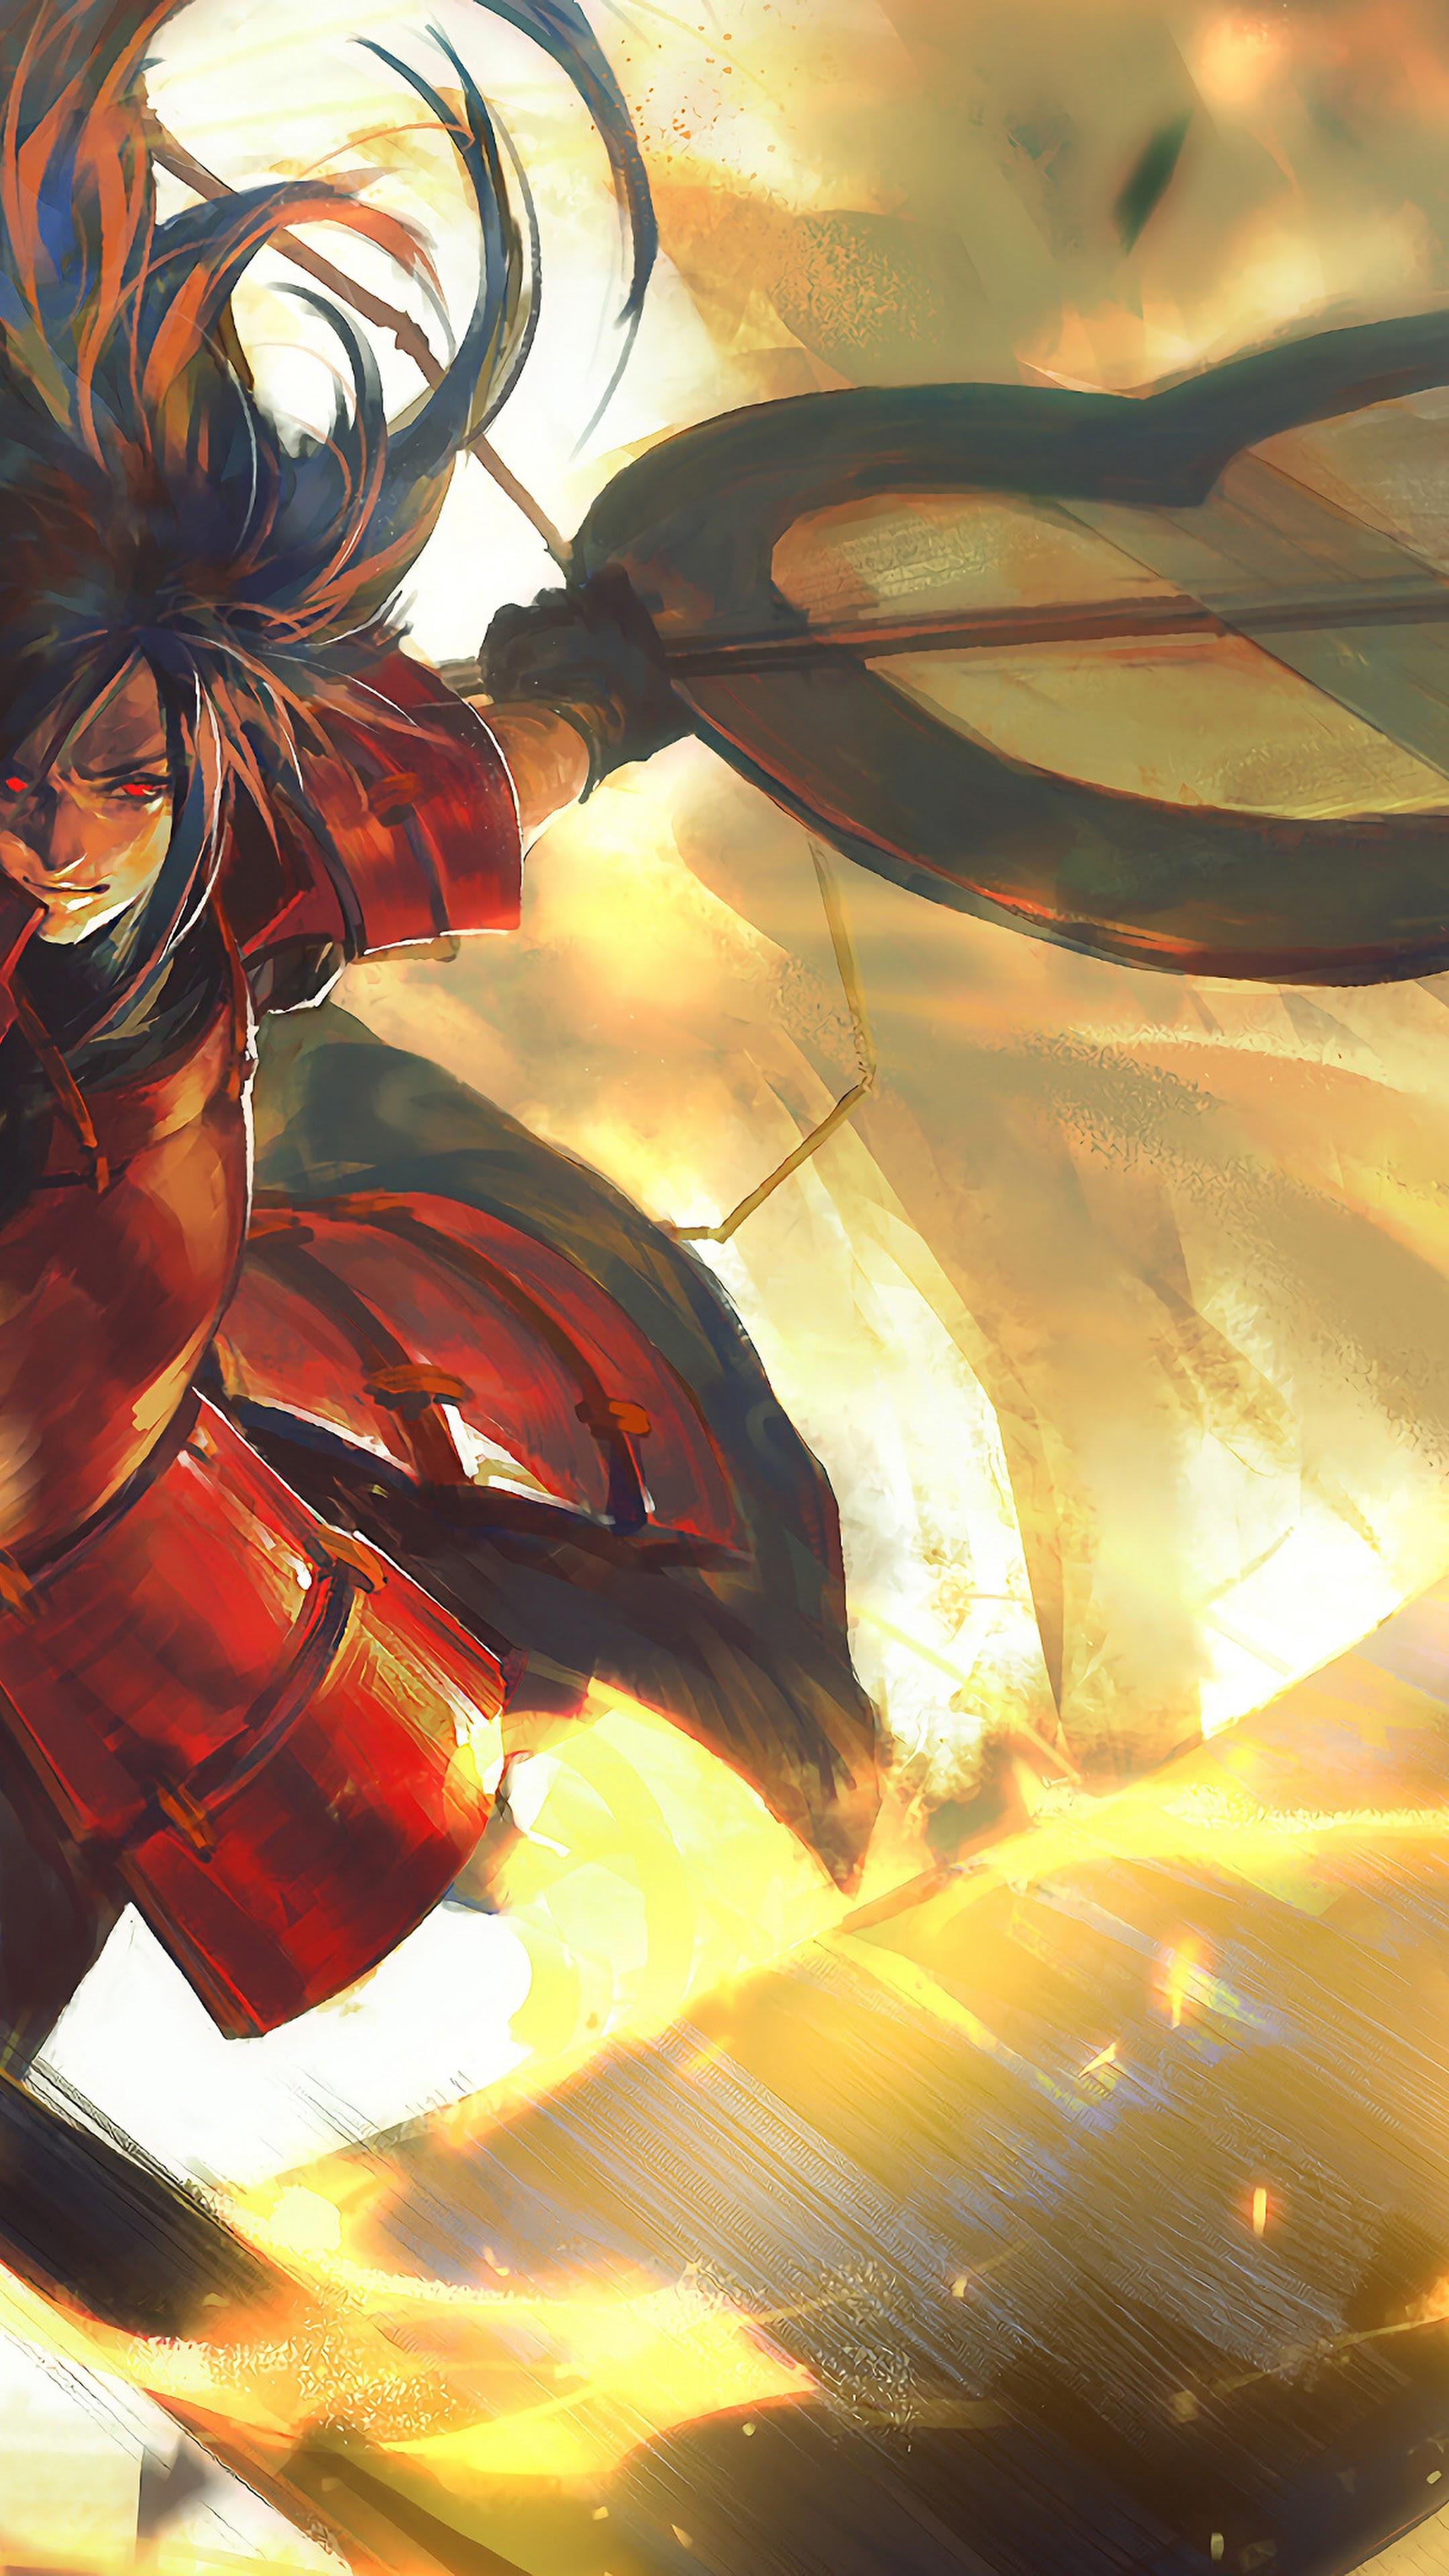 Madara Uchiha 4k Madara Uchiha Wallpaper 4k 3003553 Hd Wallpaper Backgrounds Download